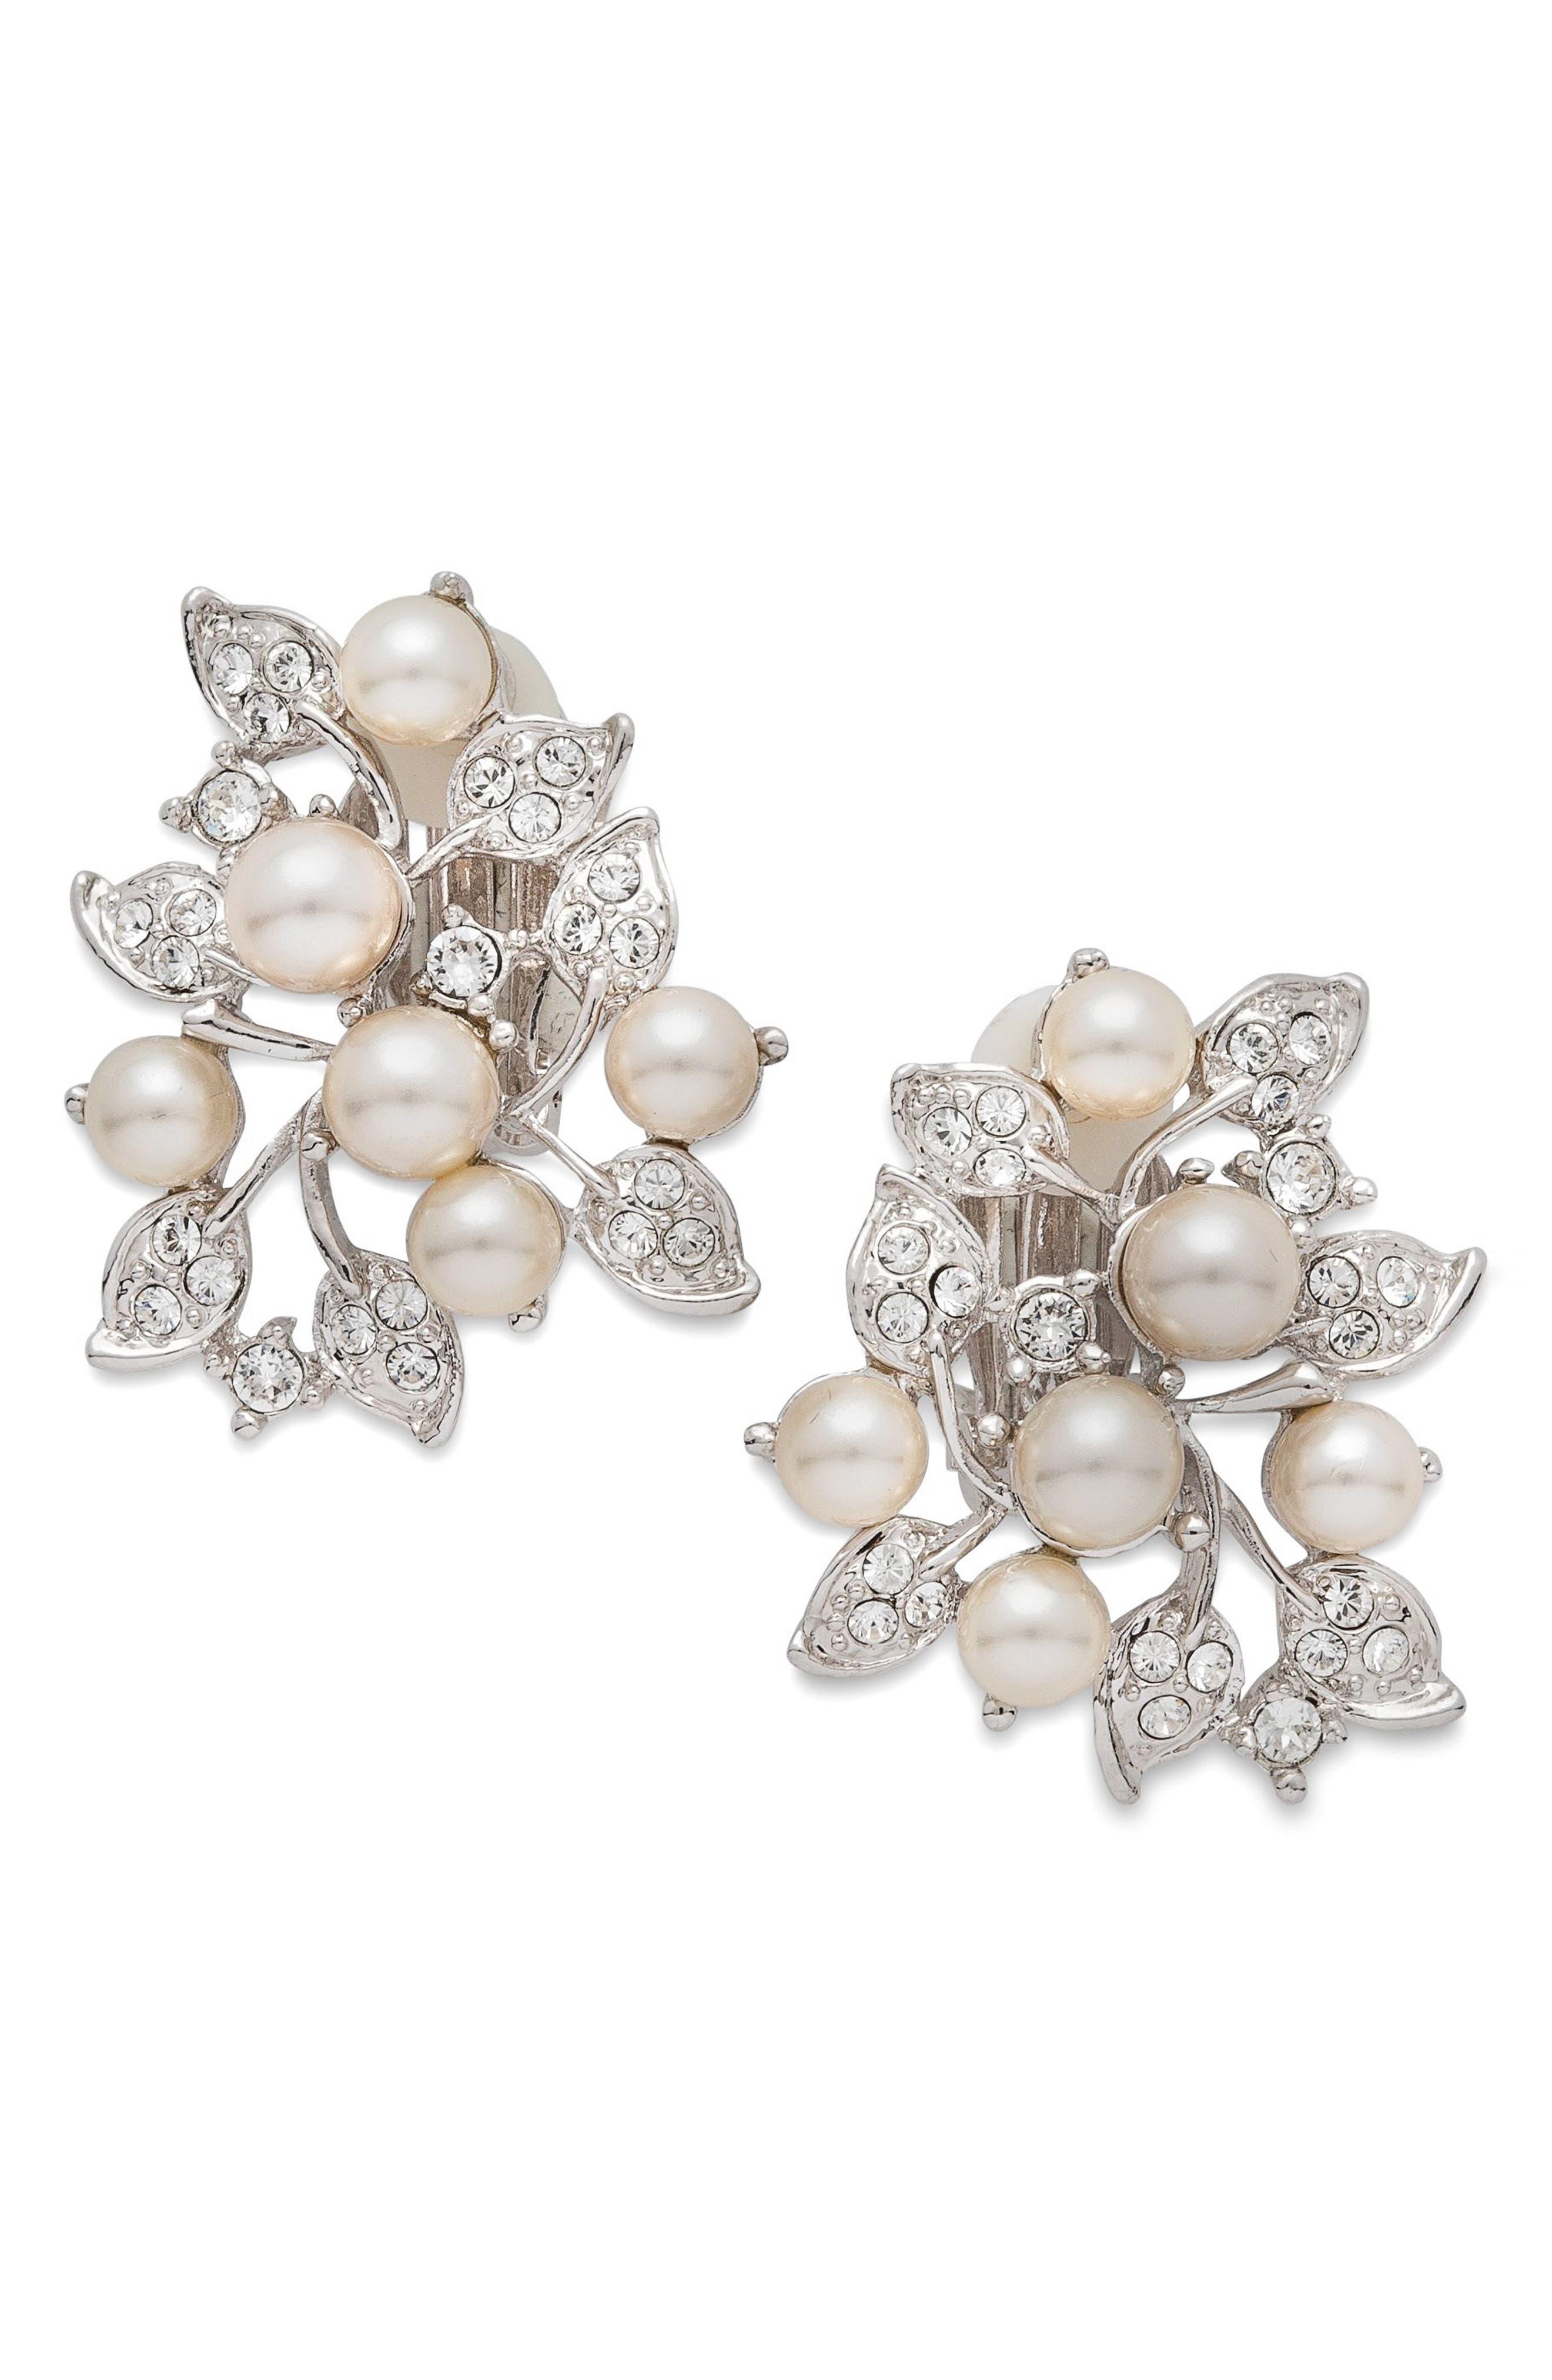 Imitation Pearl & Crystal Clip Earrings,                             Main thumbnail 1, color,                             900